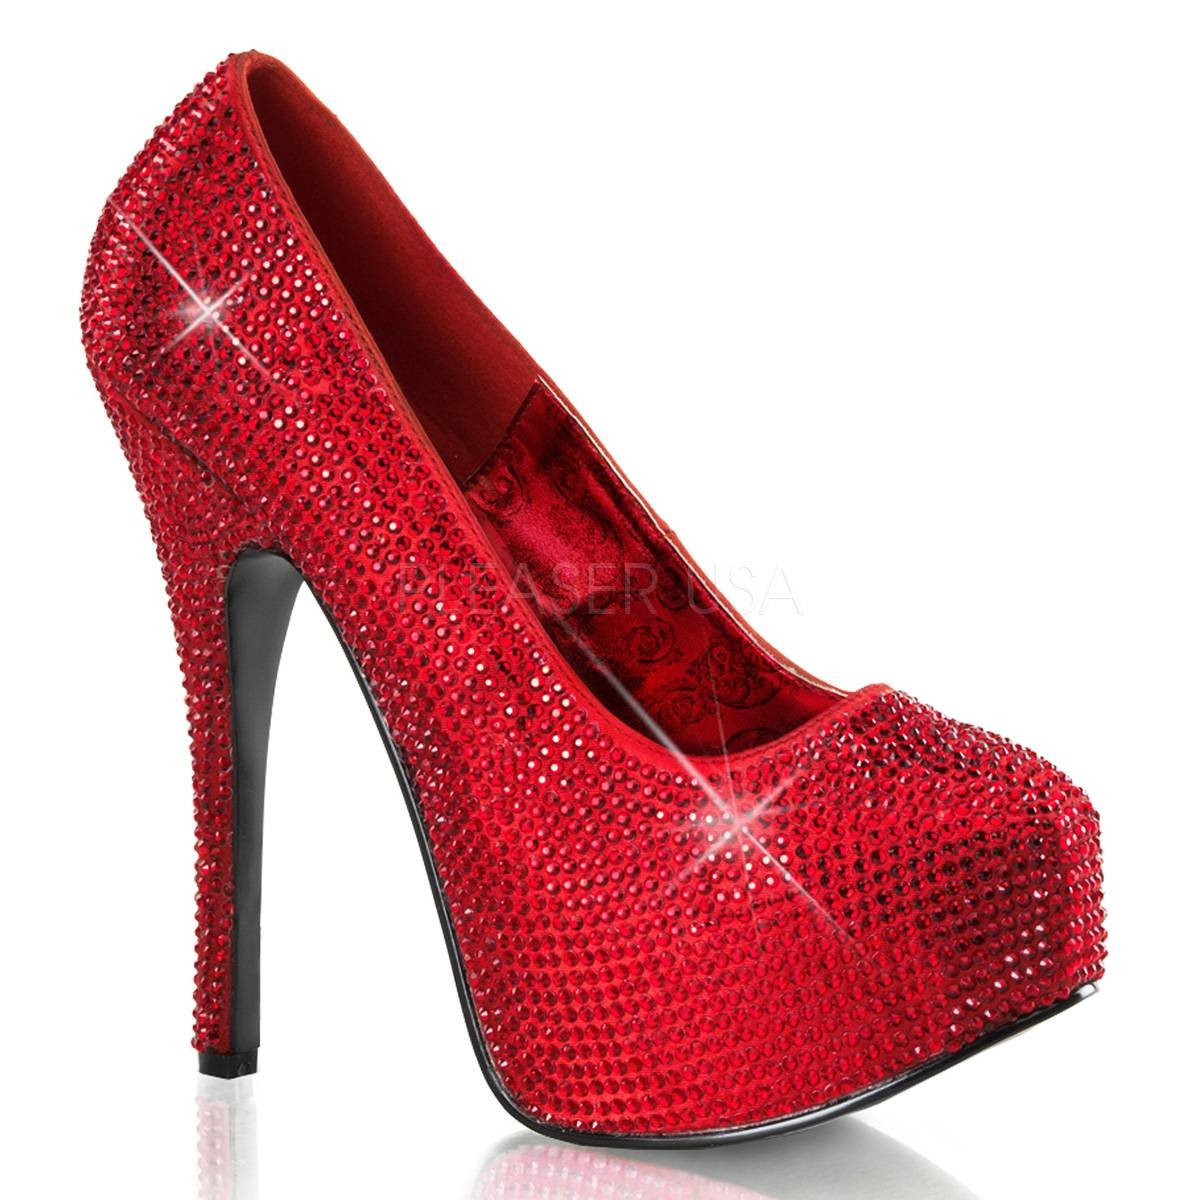 Highheels - TEEZE 06R ° Damen Pumps ° Rot Satin ° Bordello  - Onlineshop RedSixty